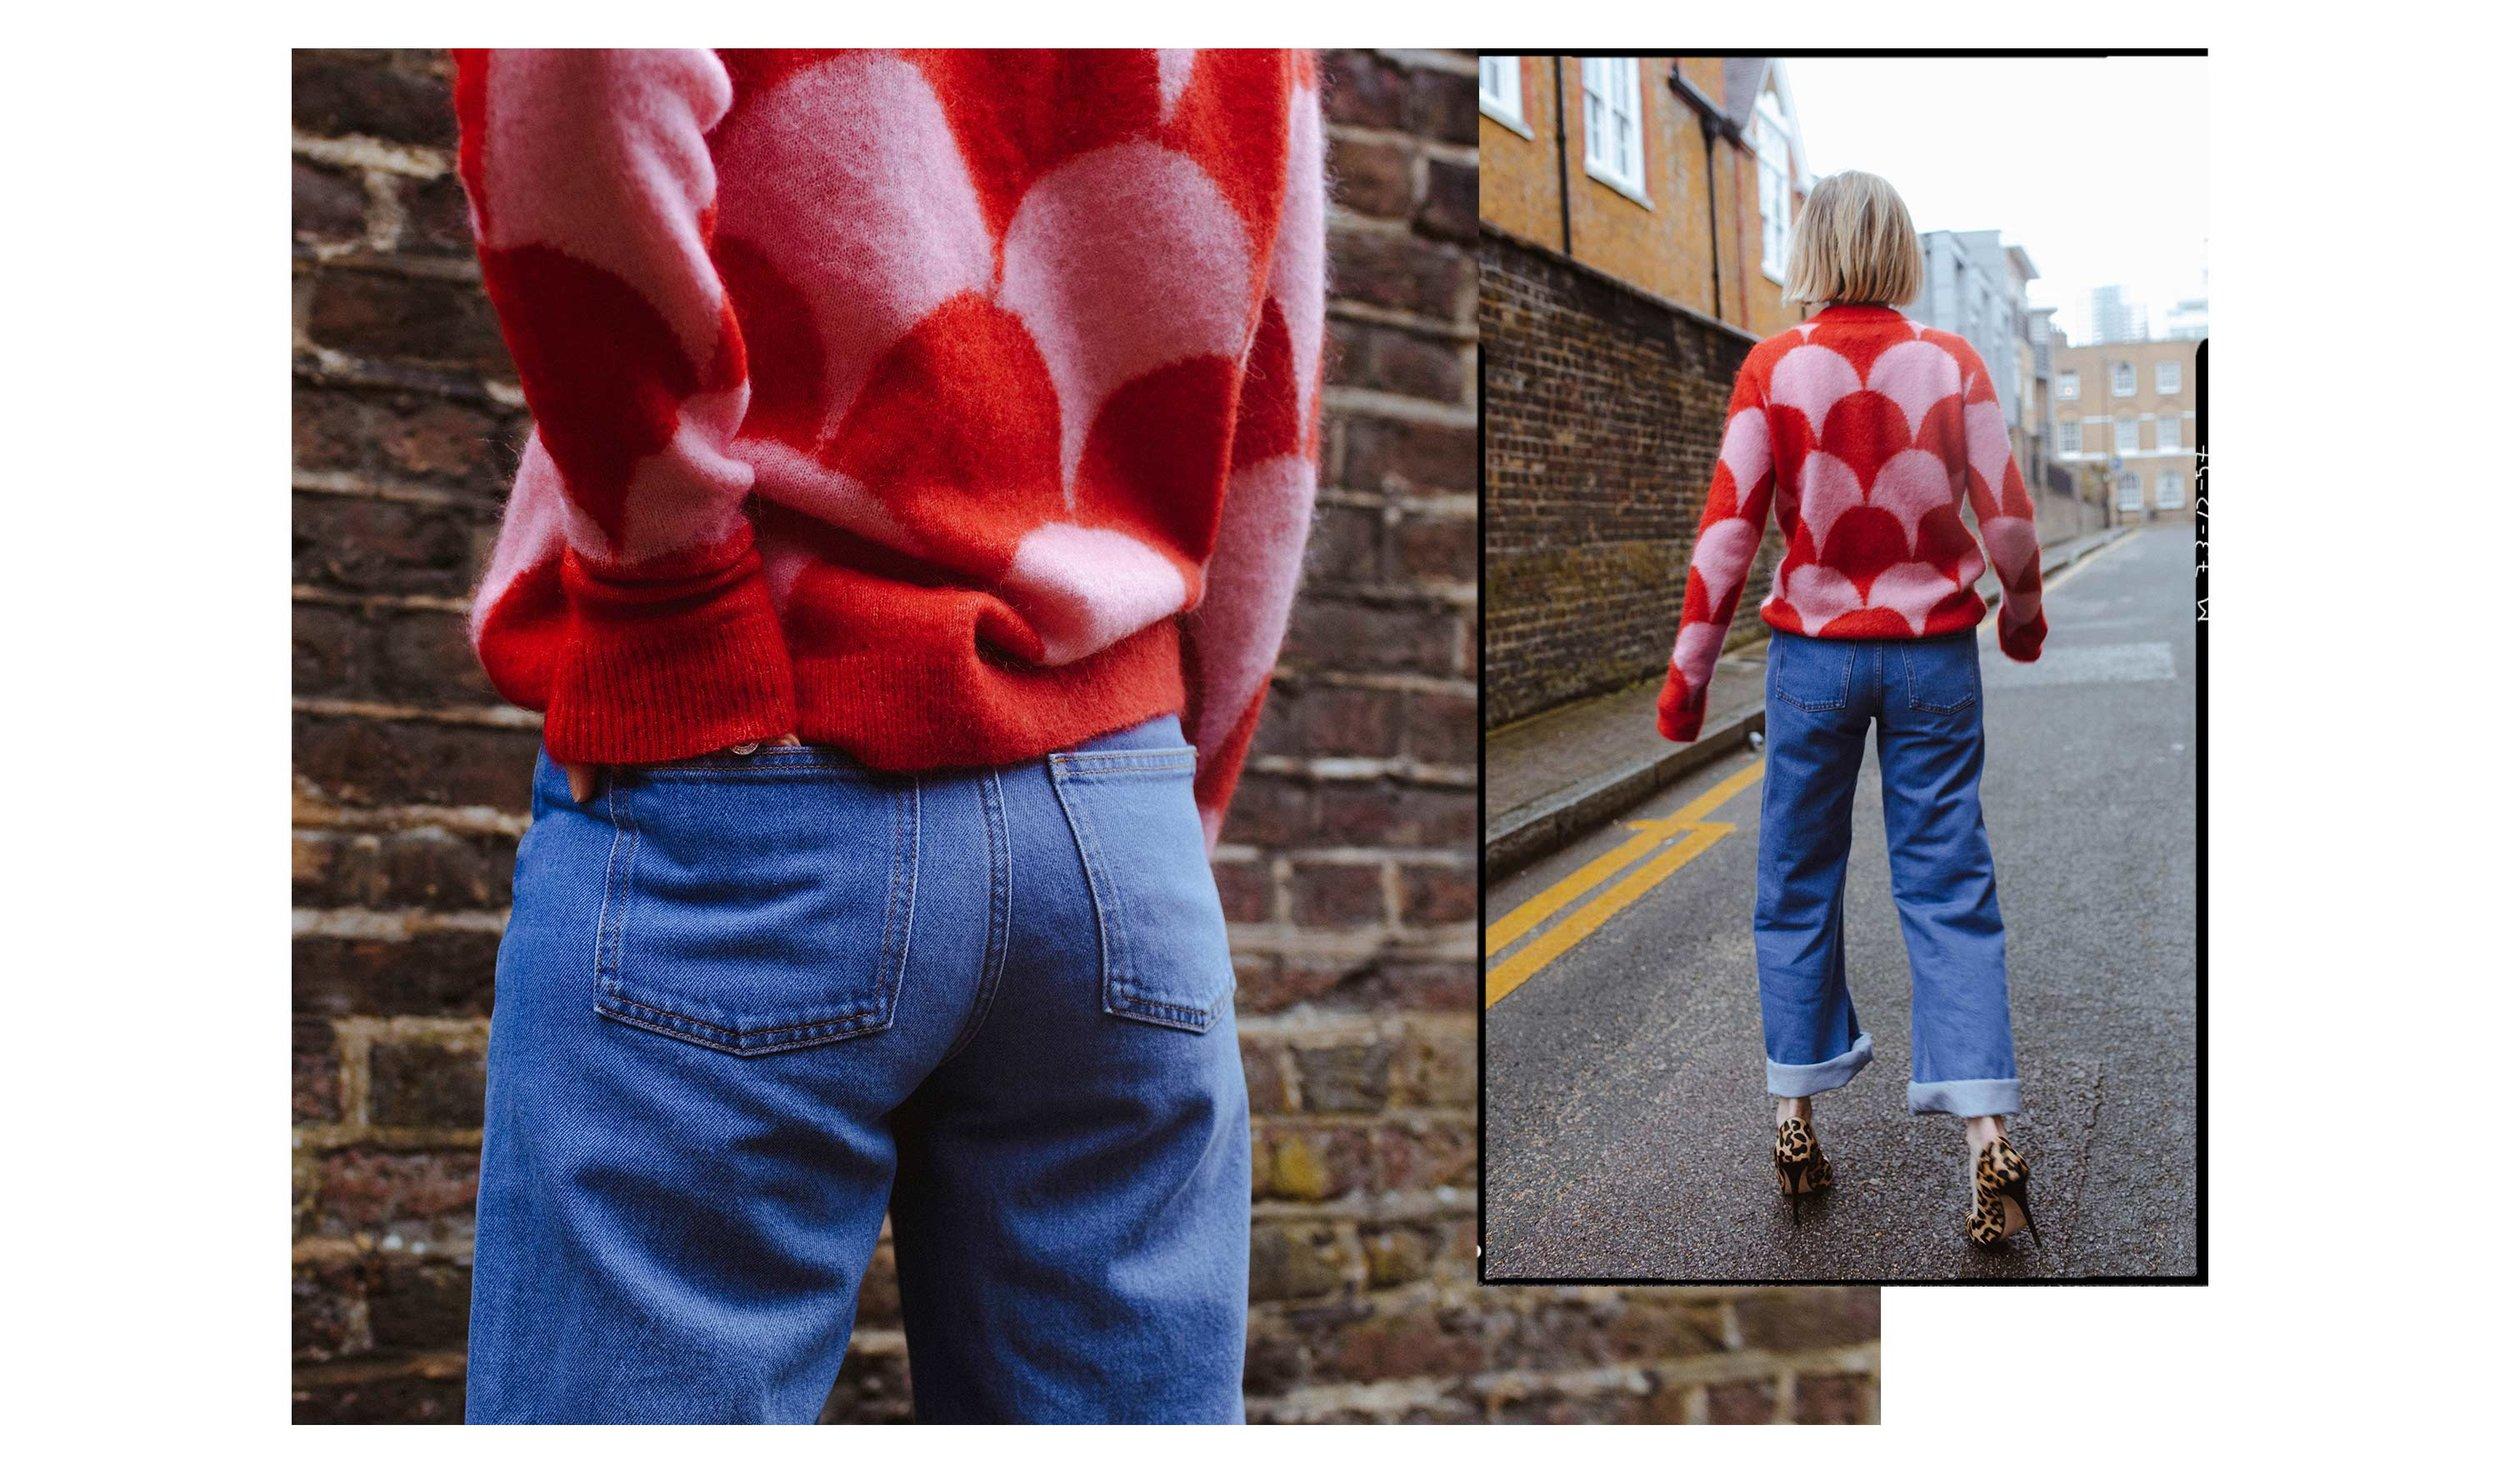 Red-coat-22.jpg